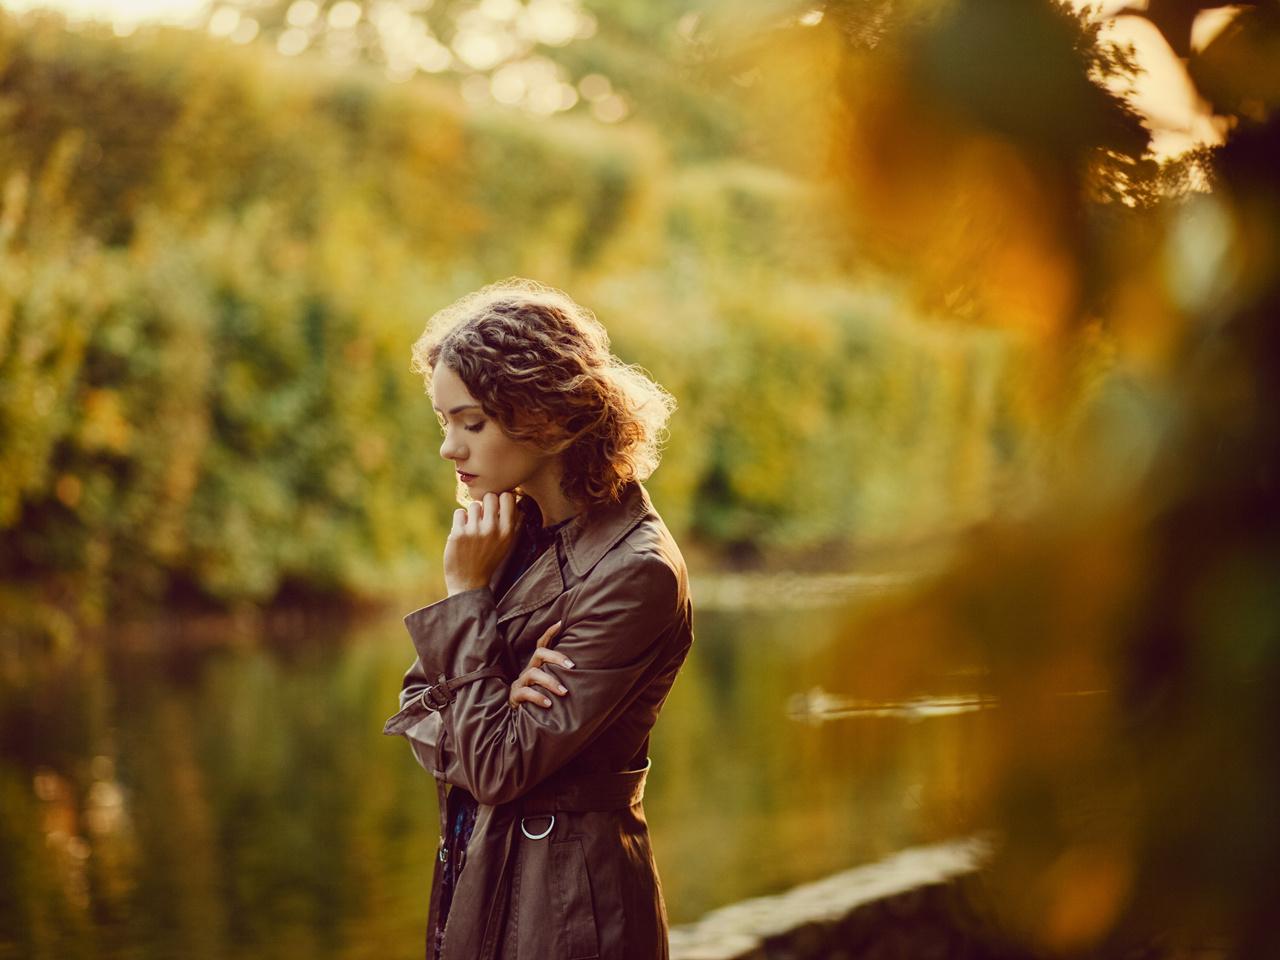 Autumn thoughts.III by Stanislaw Siedlecki